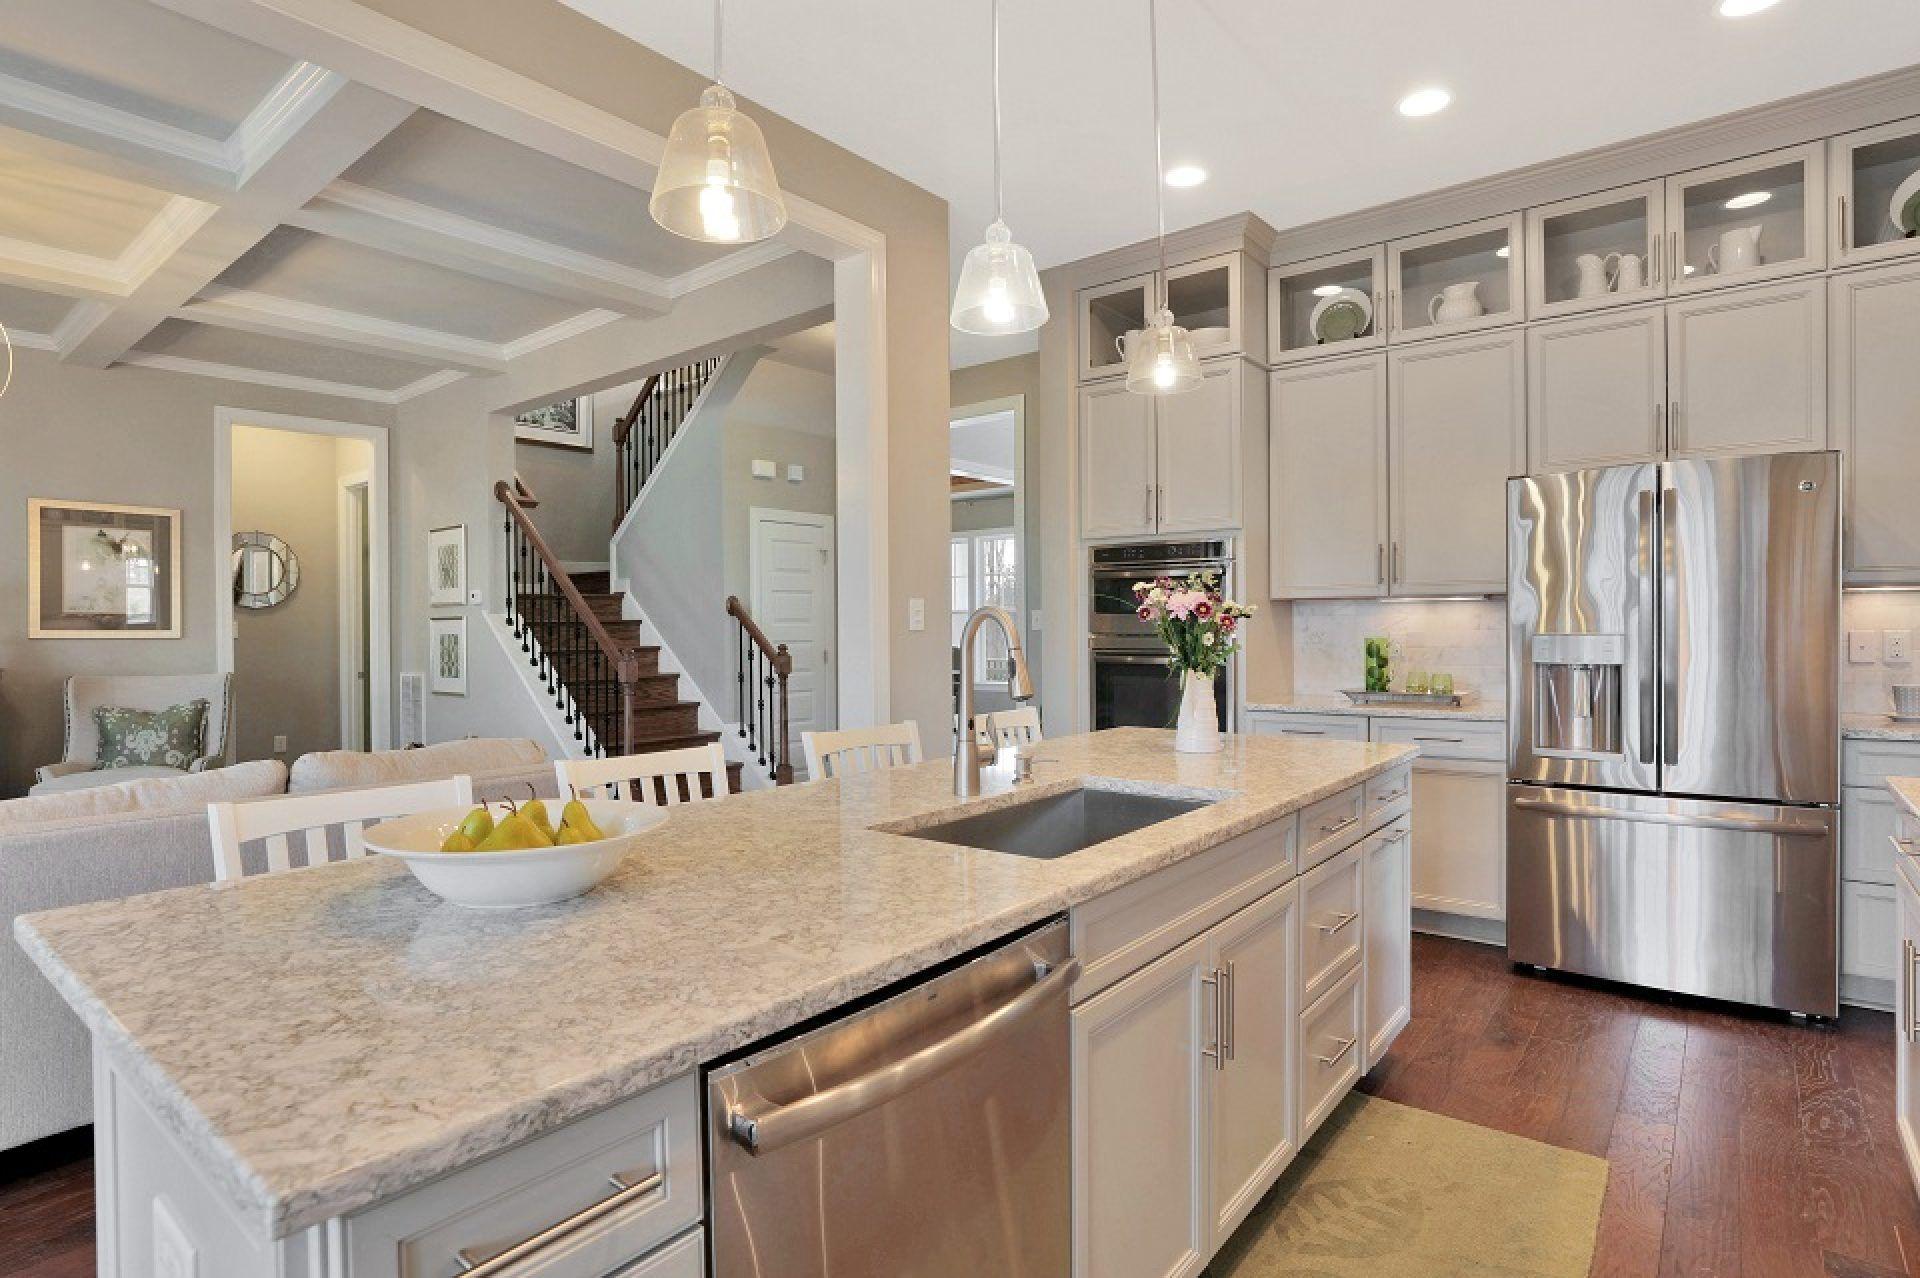 Kitchen featured in the Bradenton By HHHunt Homes LLC in Richmond-Petersburg, VA